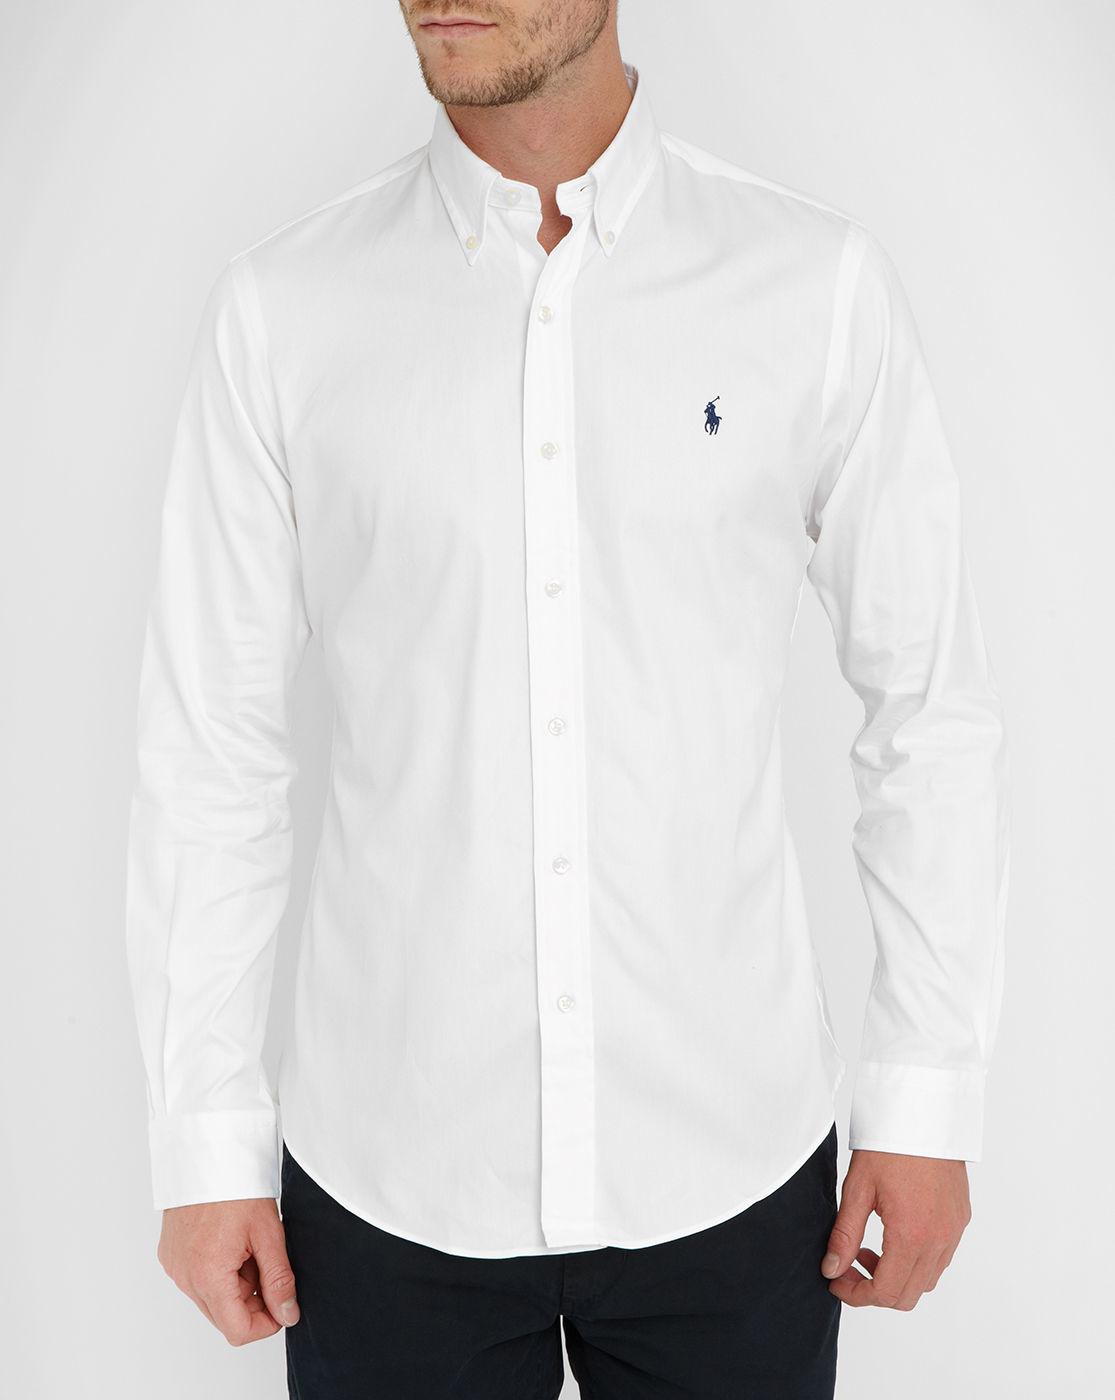 Polo Ralph Lauren White Dress Oxford Pin Point Shirt In